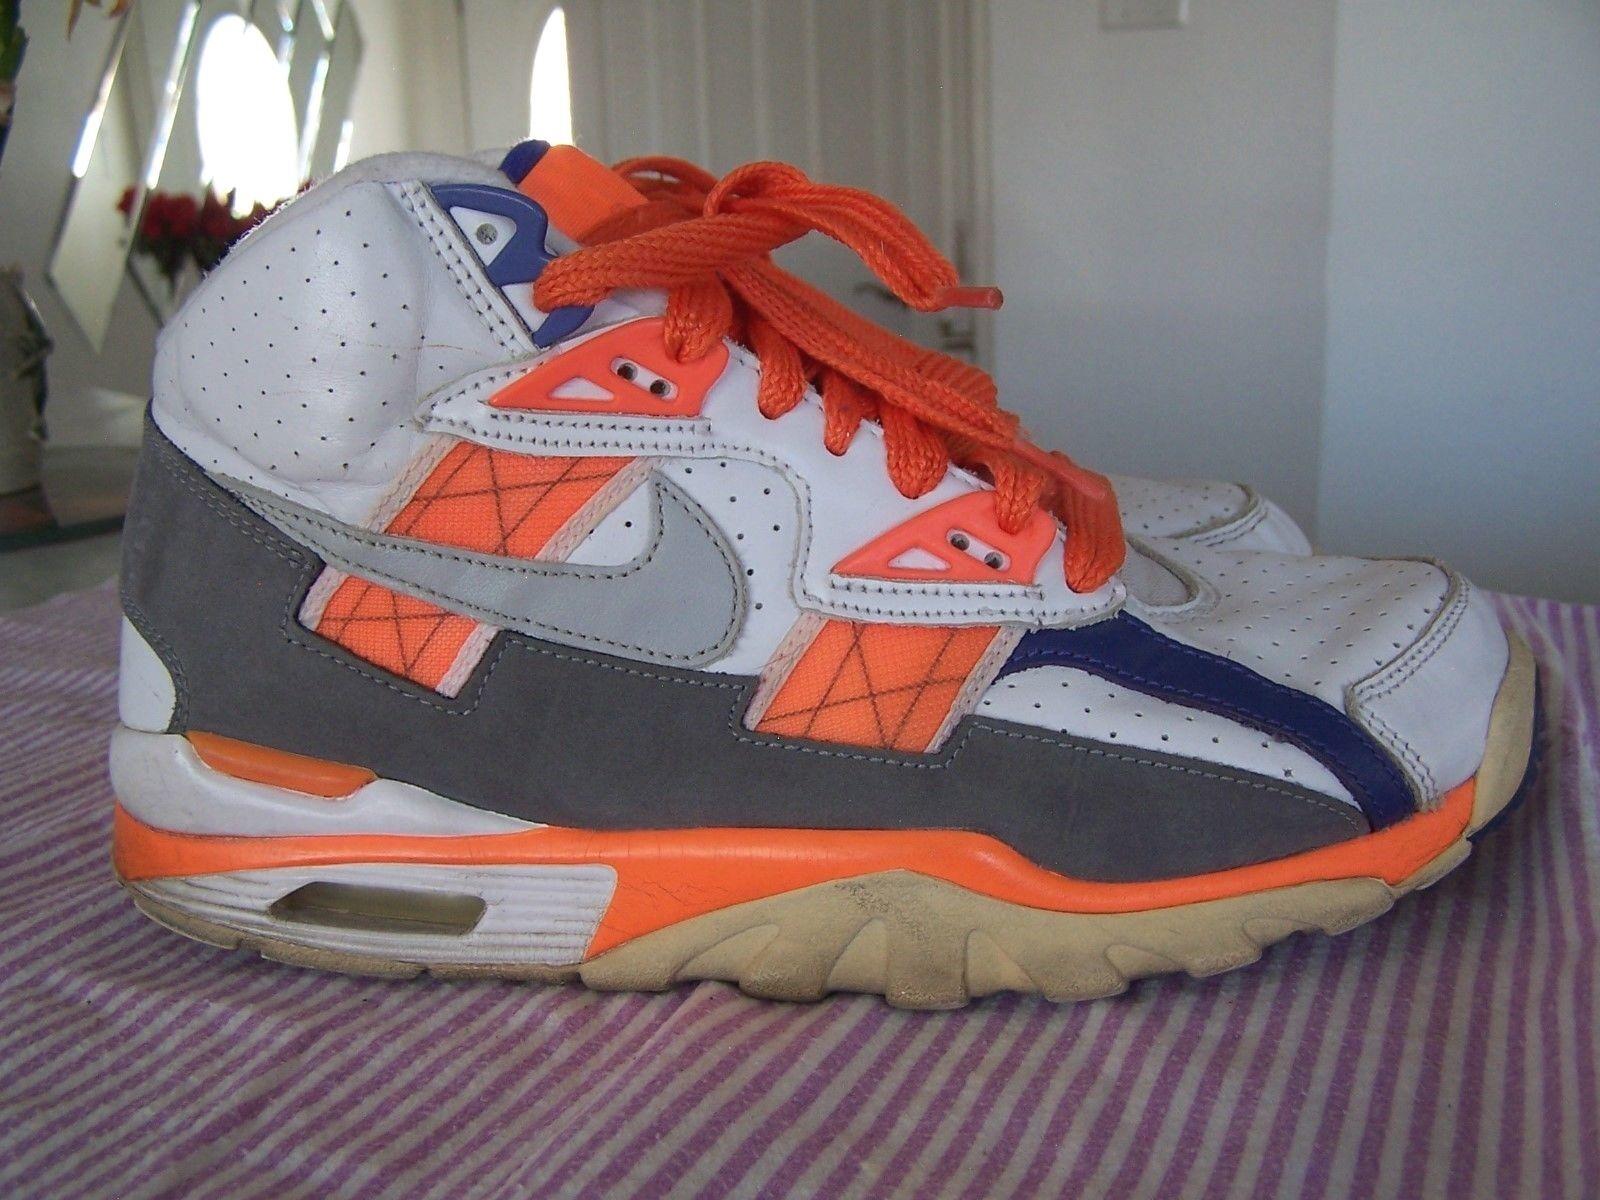 Nike Air hombre Trainer naranja SC Hola retro azul naranja Trainer zapatos cómodos 0ae6ba